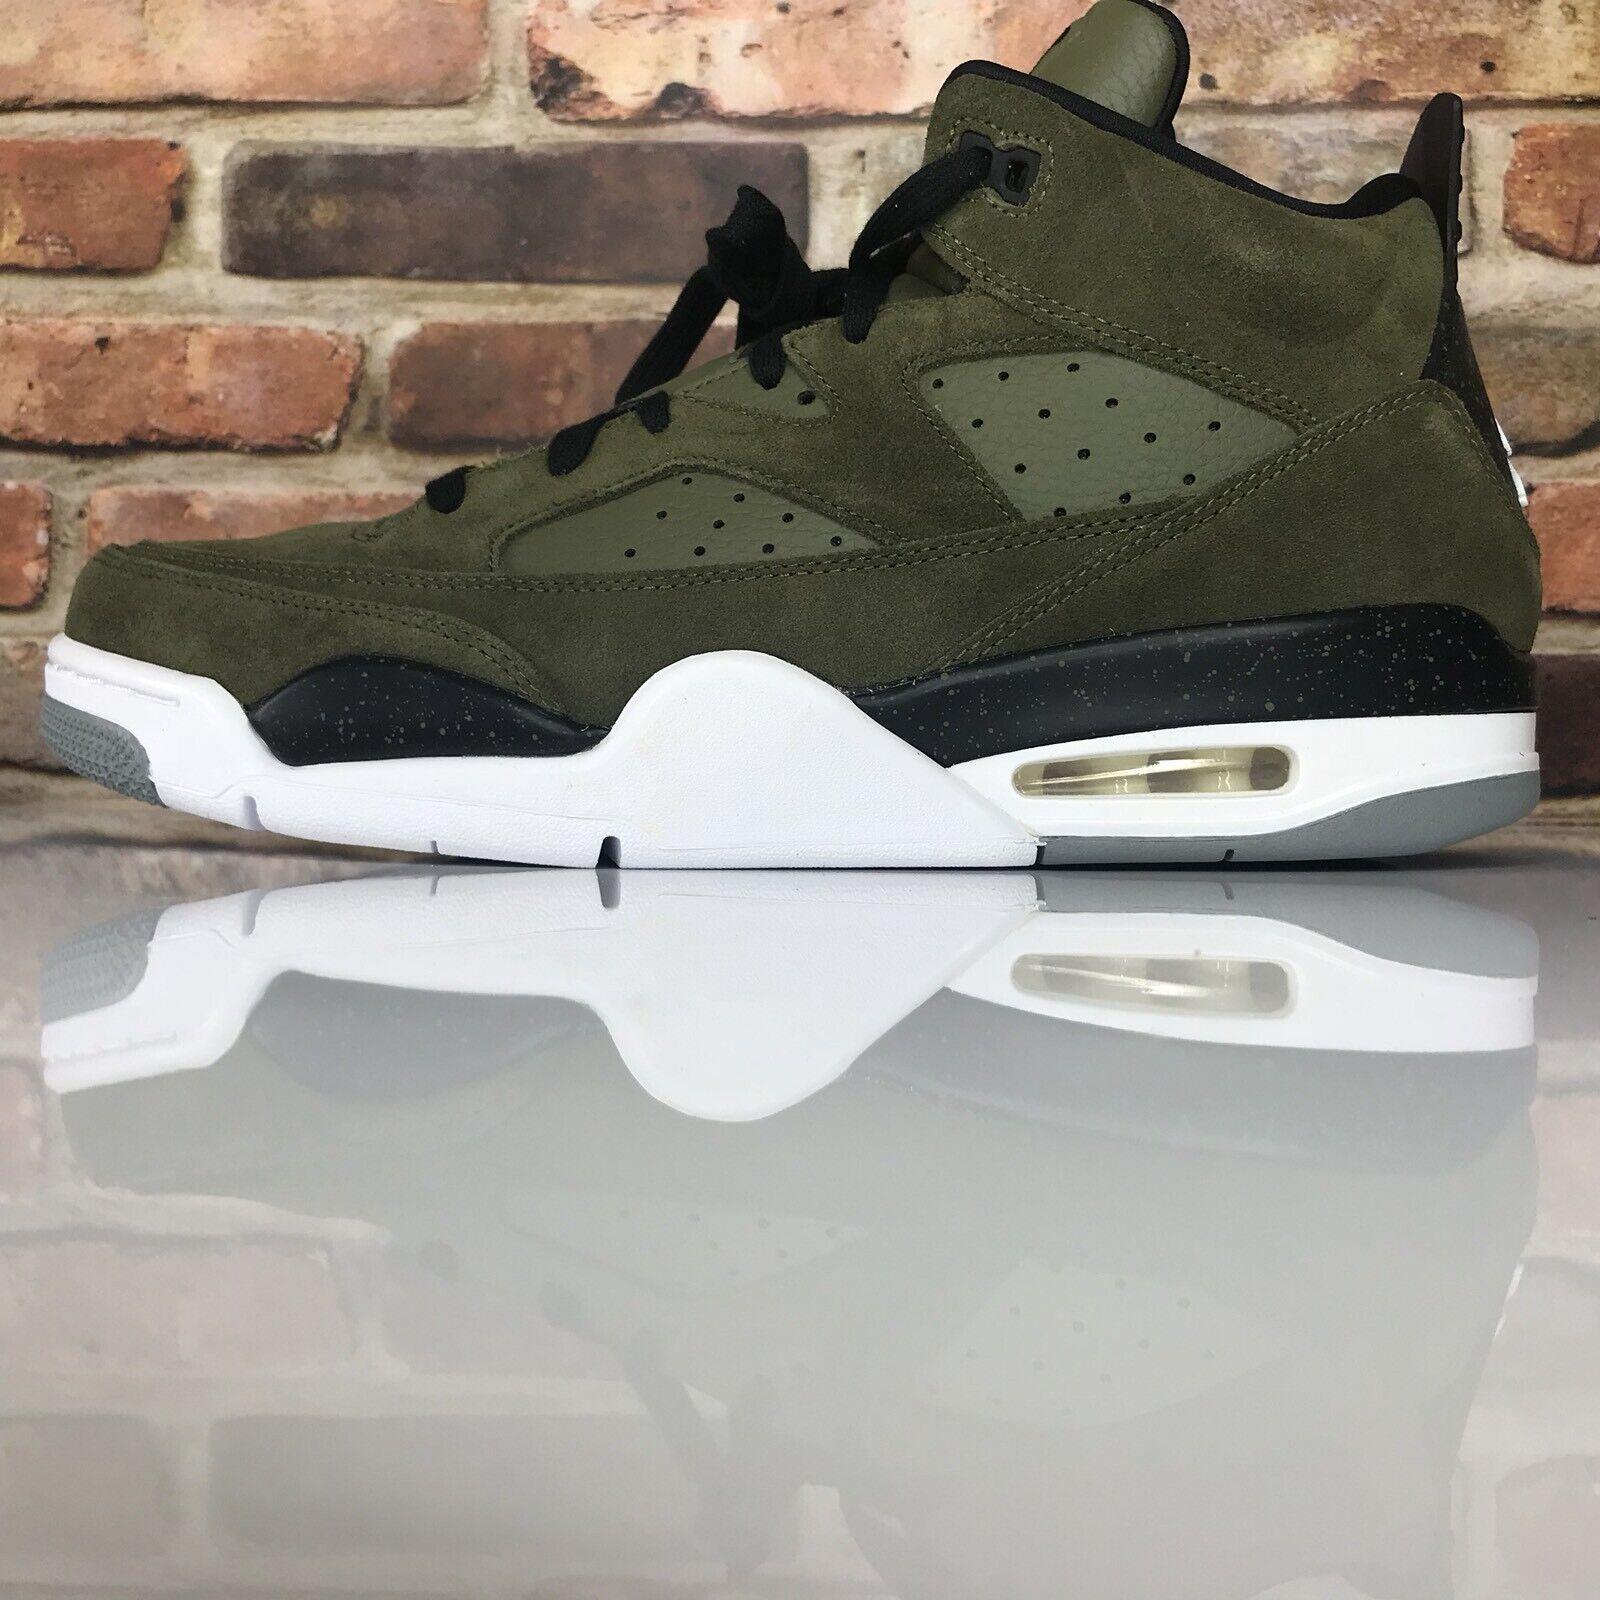 d2213ca8587a27 Nike AirJordan Son Son Son Of Low Men s Size 12 shoes Olive Canvas White- Black